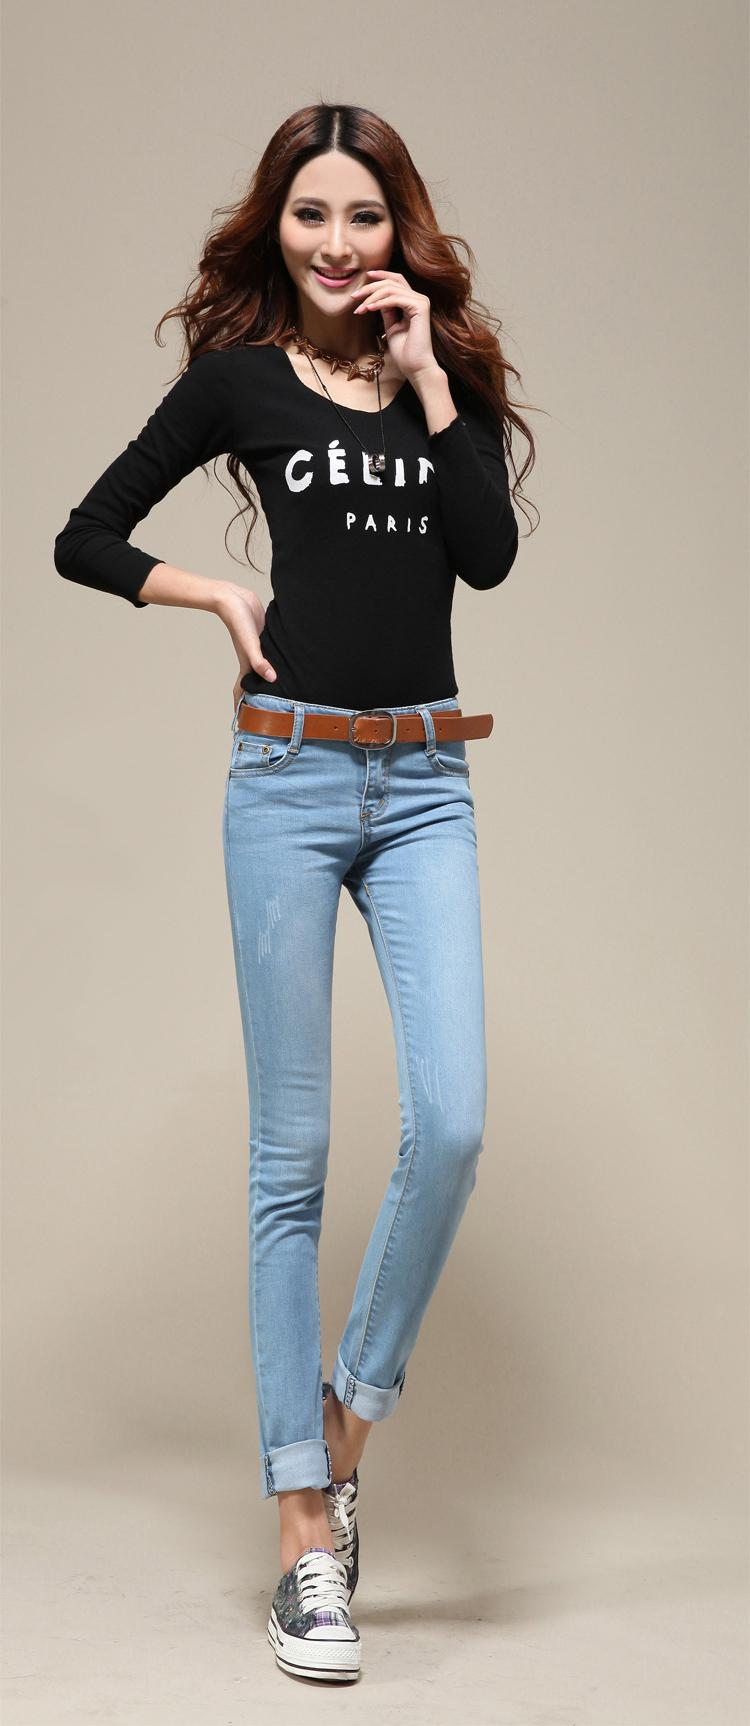 2021 Hot Fashion Sexy Lady Jean Womens Jean Skinny Jean